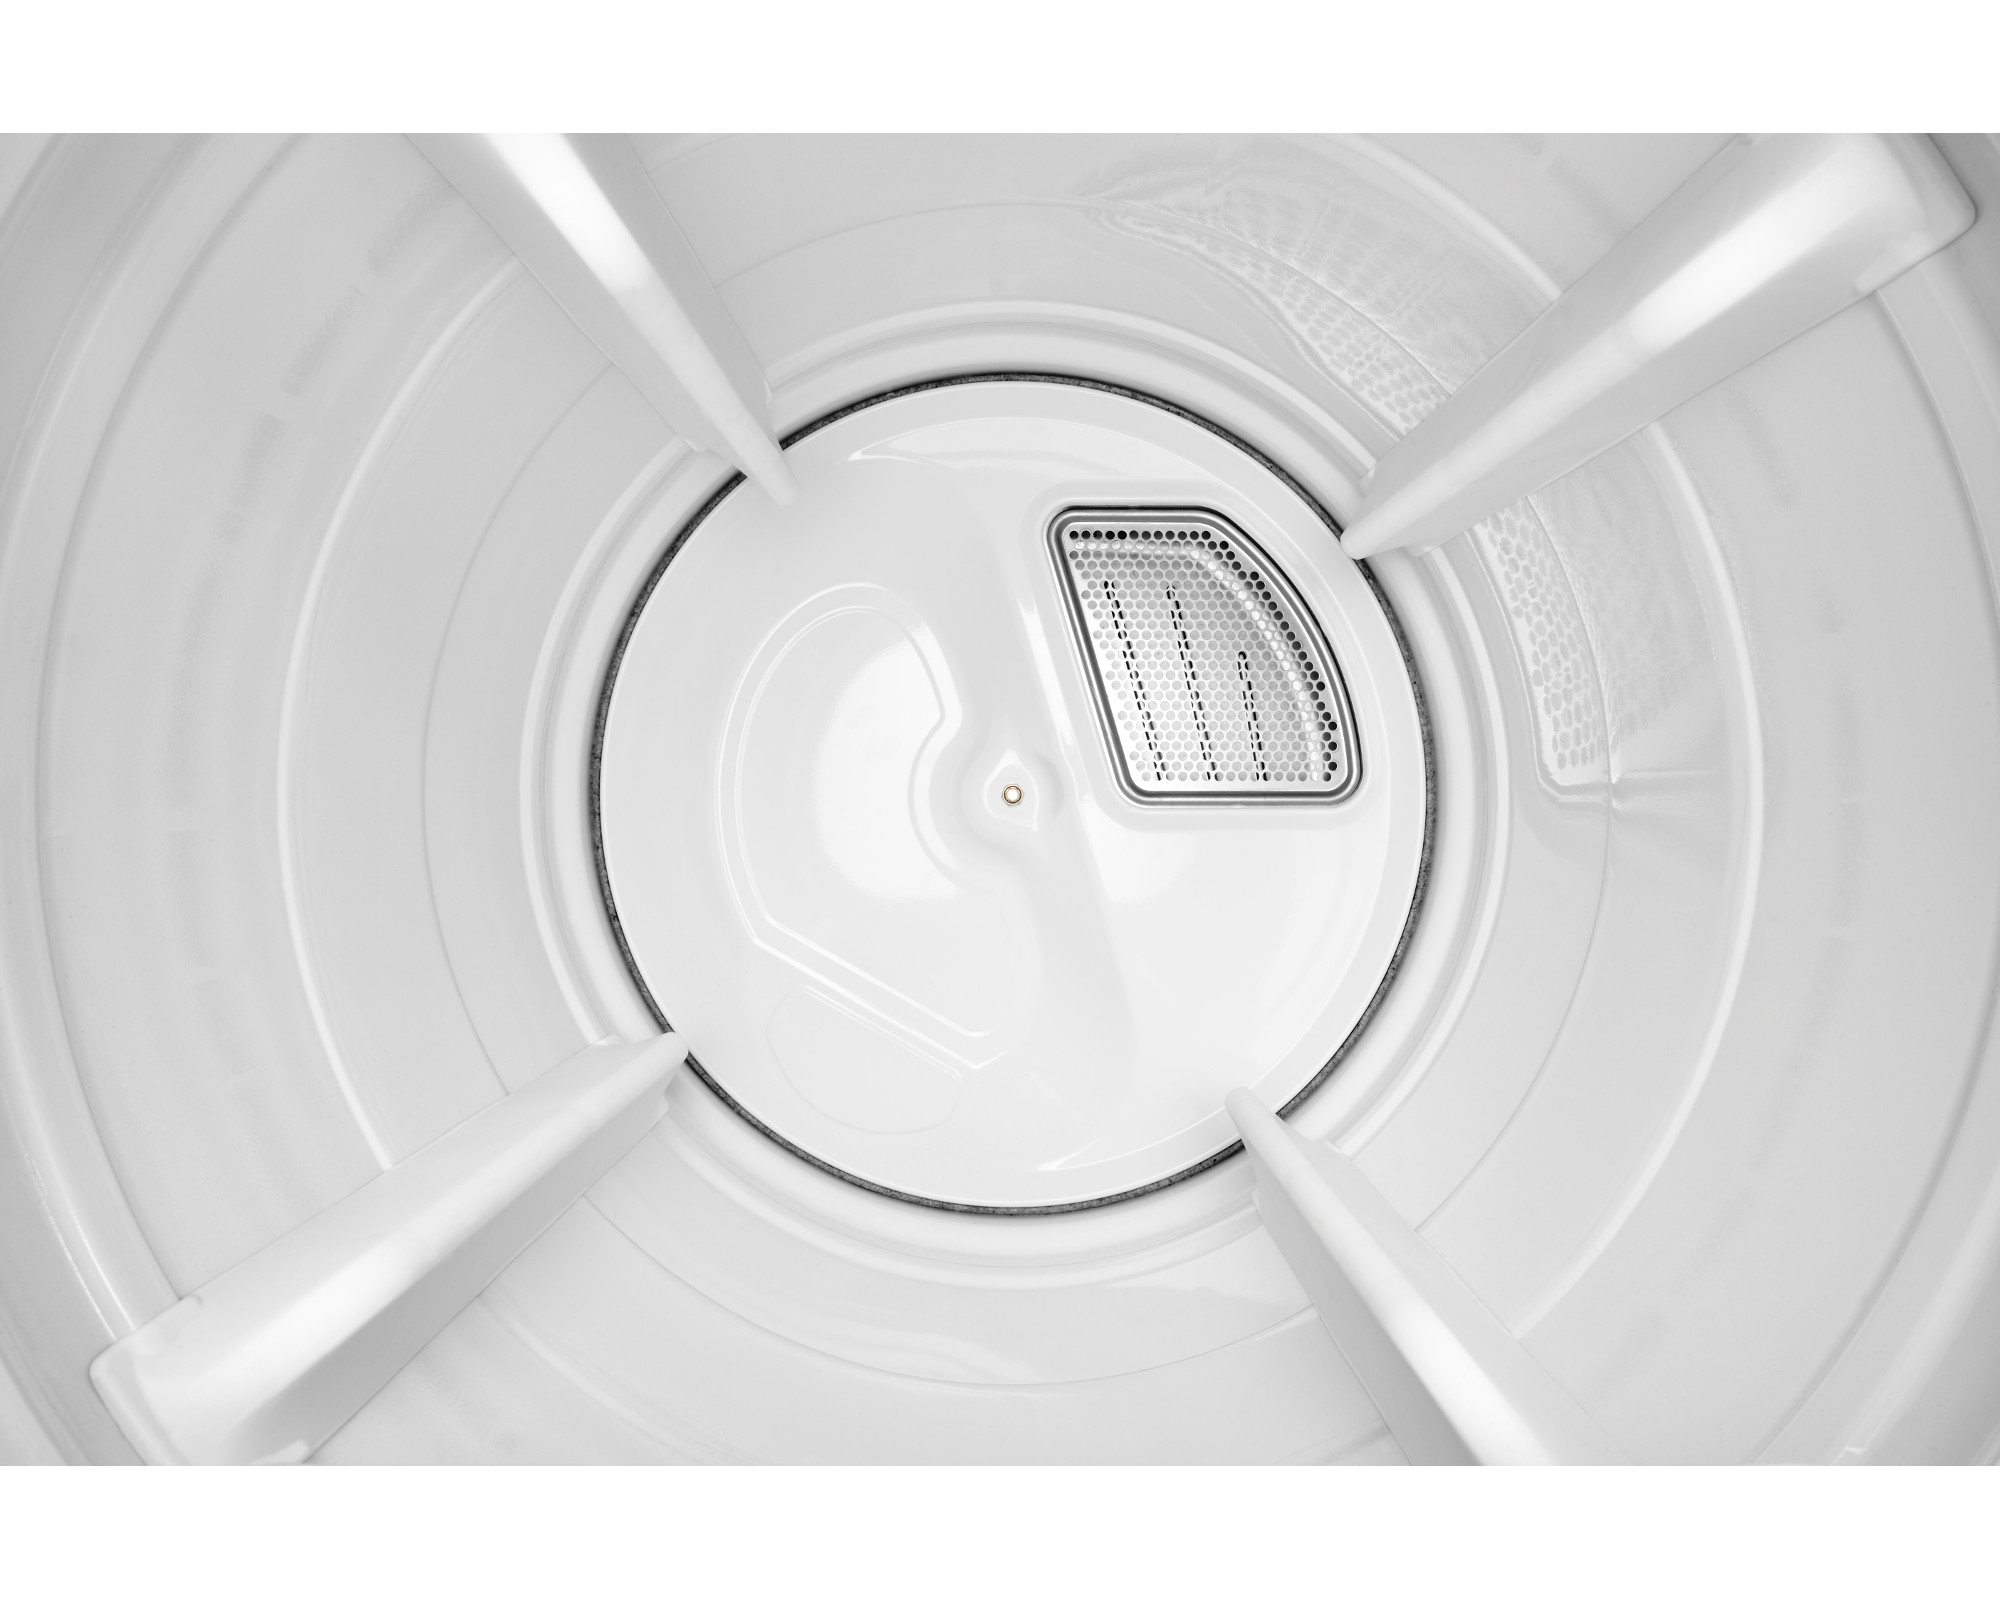 Whirlpool WED8700EC 8.8 cu. ft. Smart Cabrio® Electric Dryer w/ Laundry App - Chrome Shadow